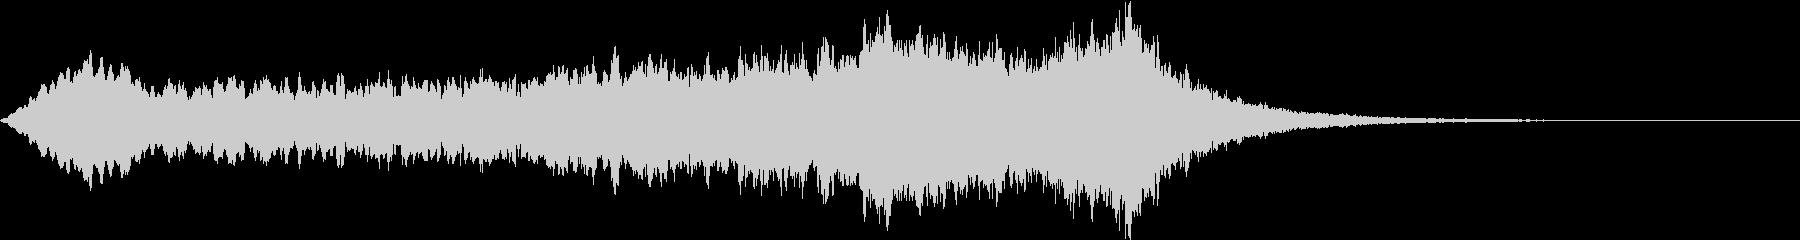 CINEMATIC RISER_30の未再生の波形